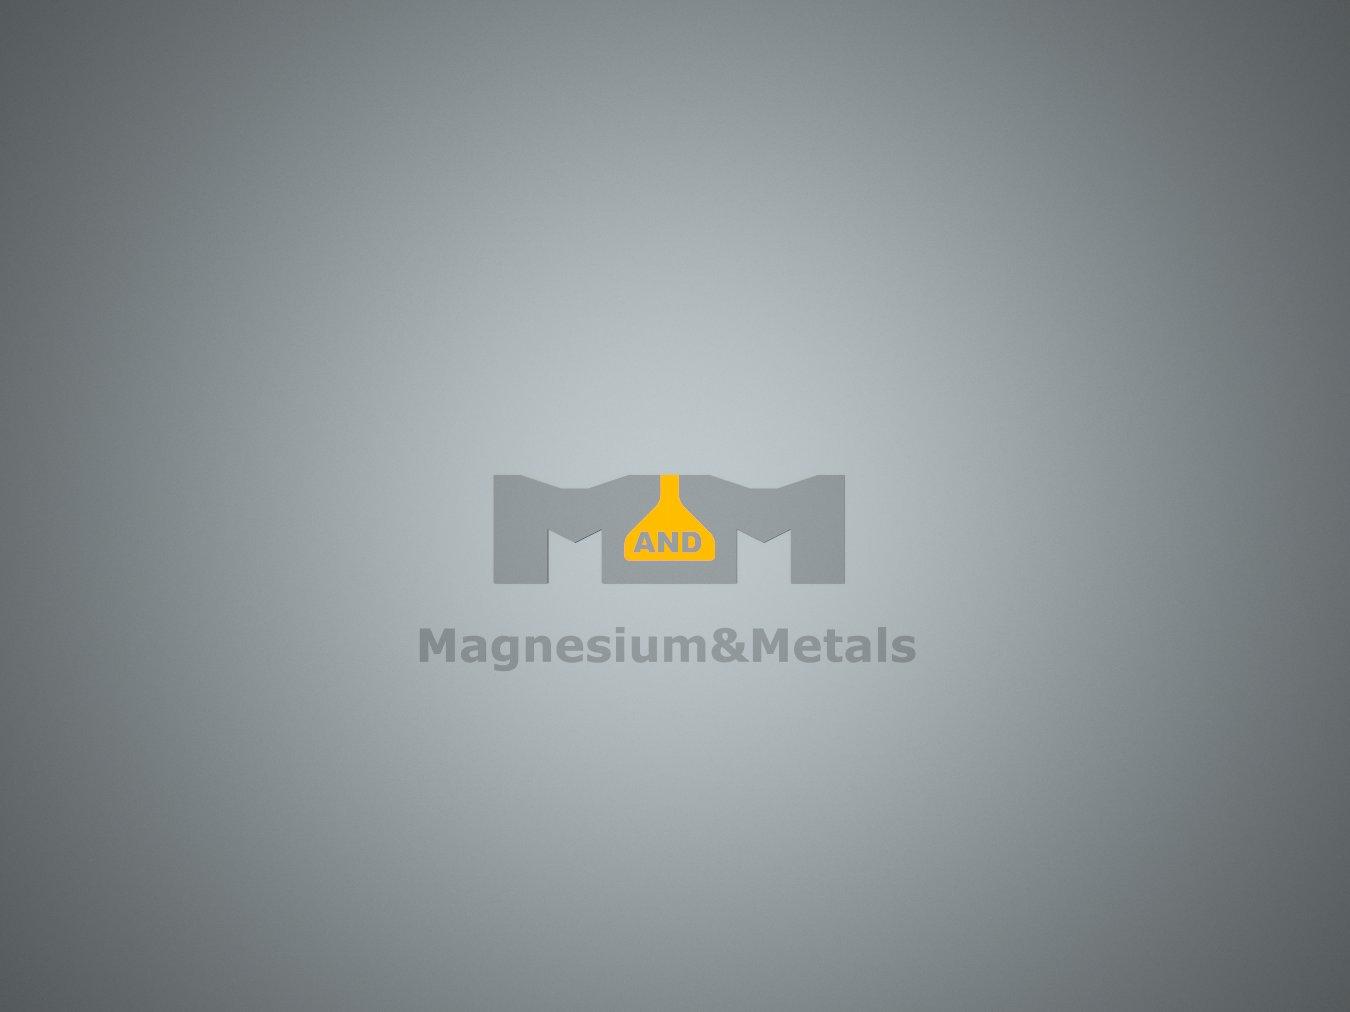 Логотип для проекта Magnesium&Metals фото f_4e92d1f533cdb.jpg